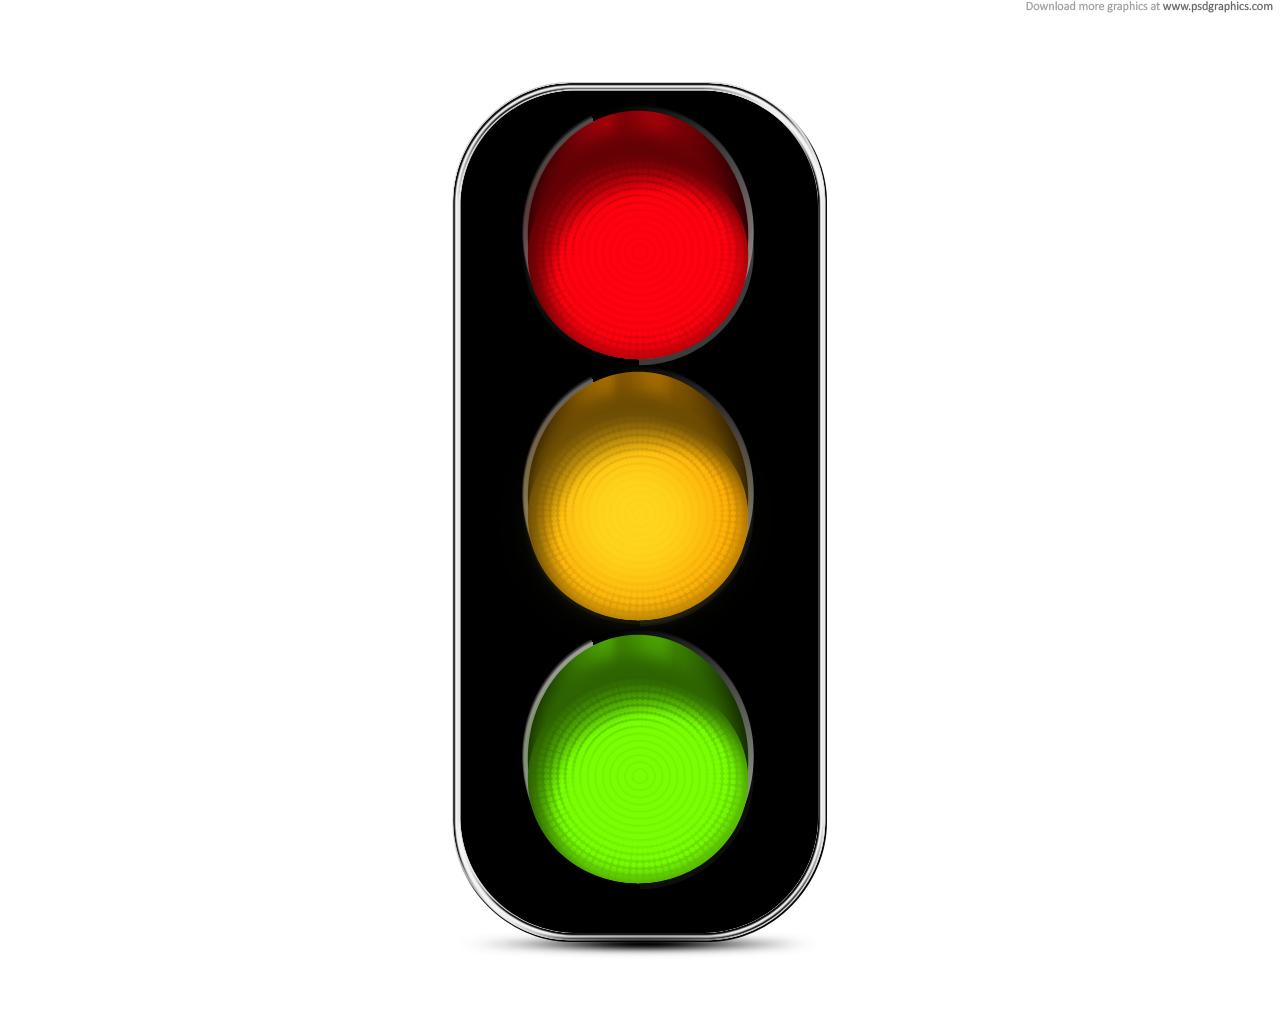 Traffic Signal Lights Clipart.